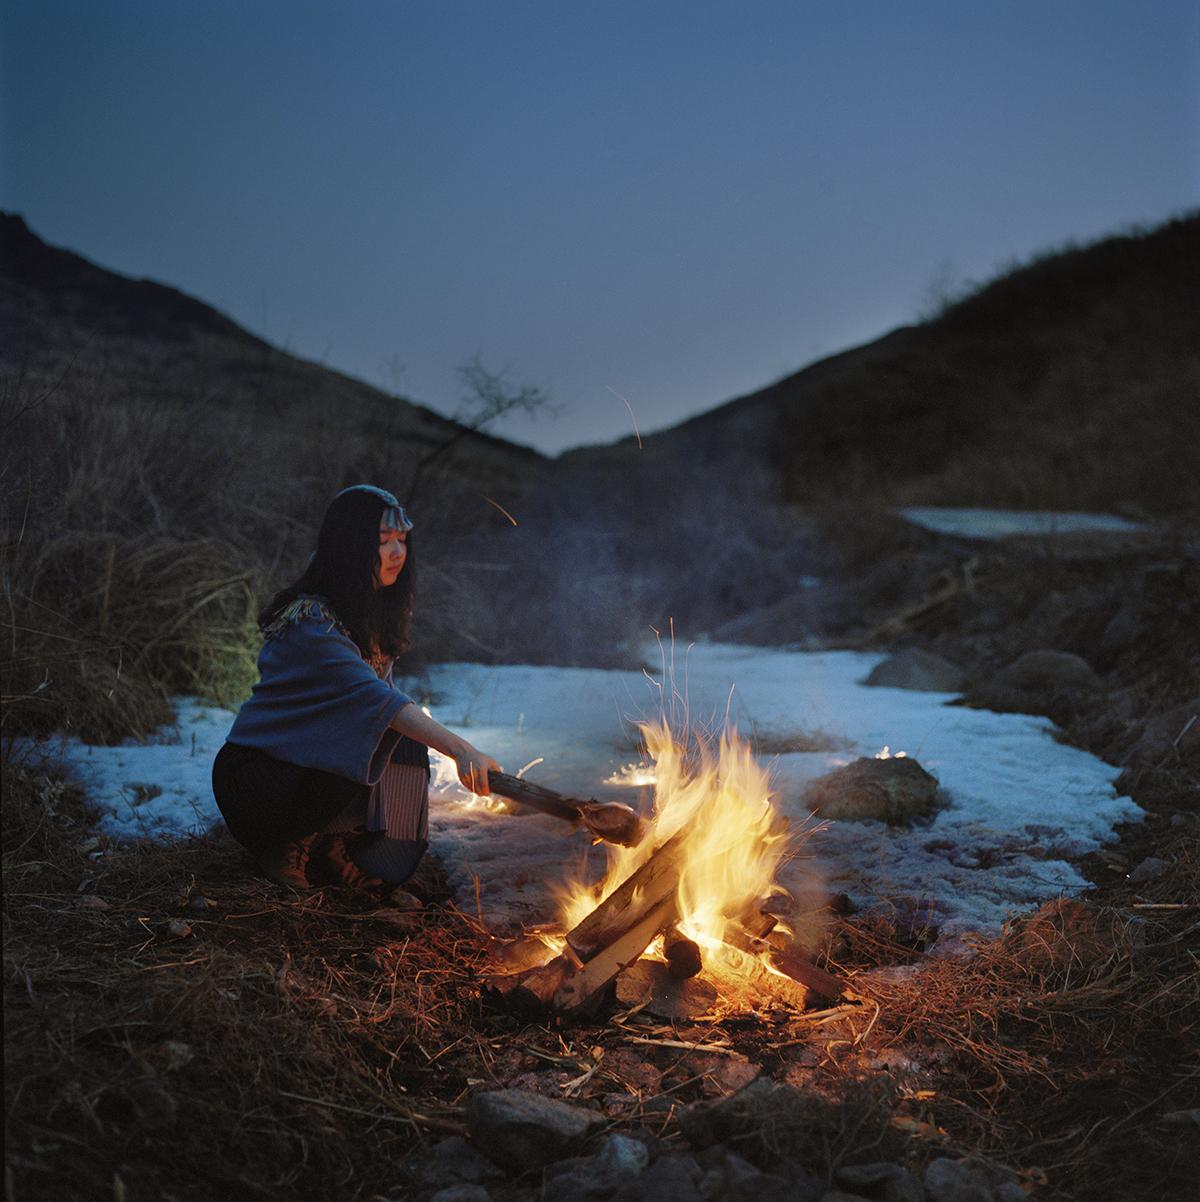 liu-shuwei-photography-of-china- 05 B childhood revisited 03.jpg